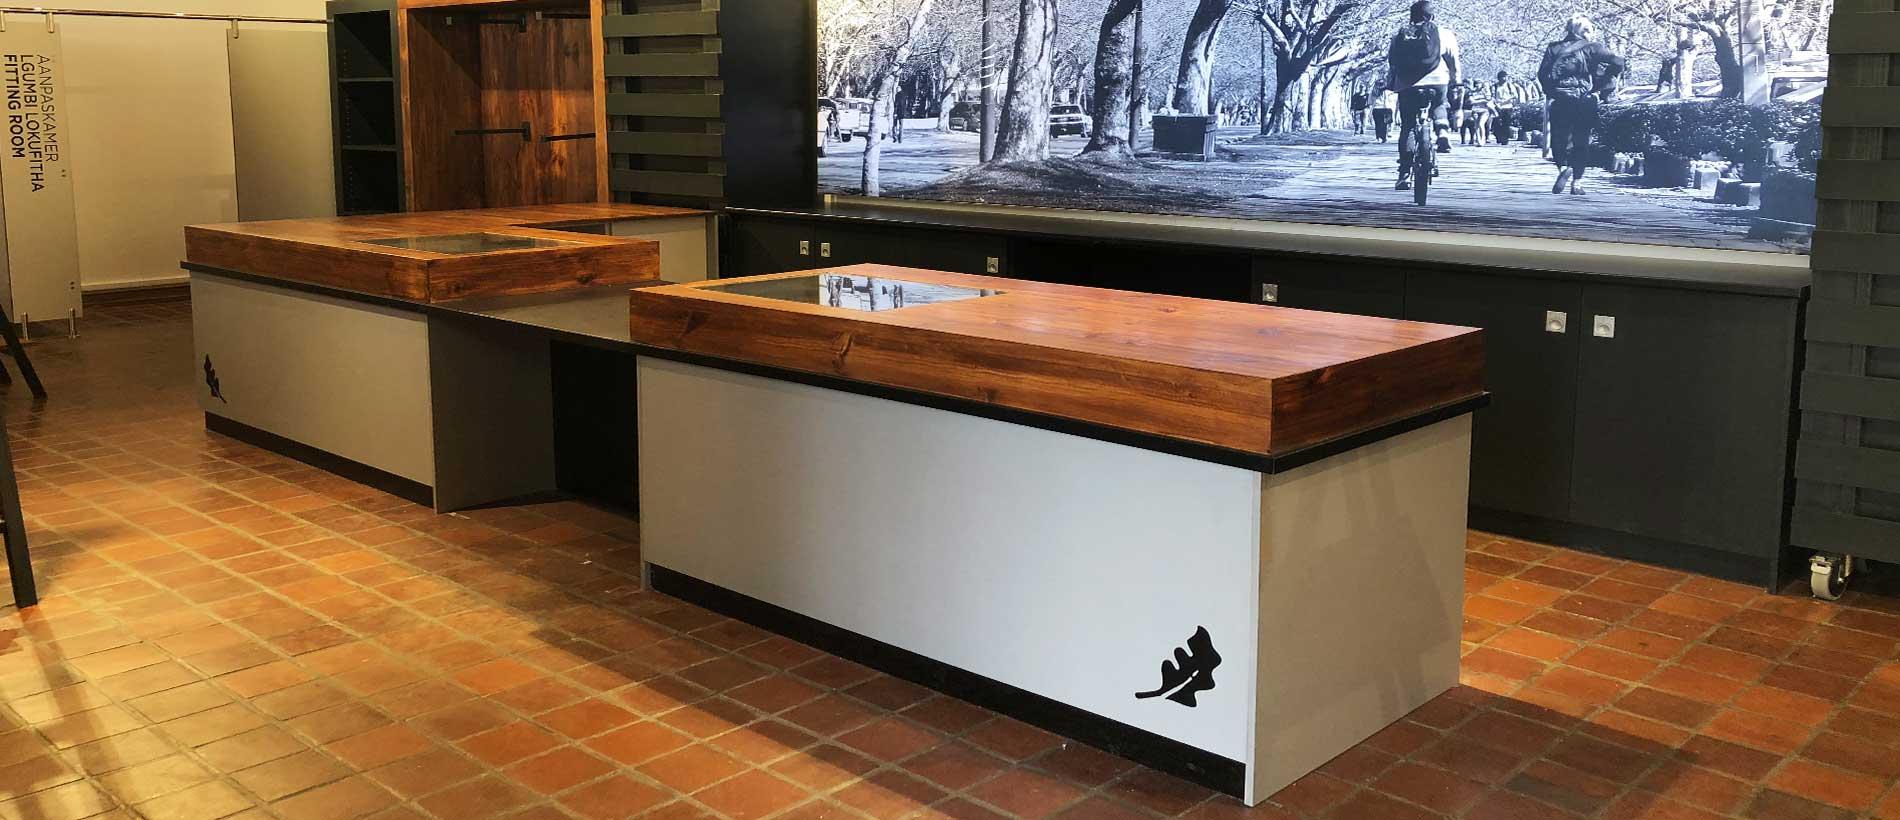 4id Retail Interior Design Shop Fitting 1